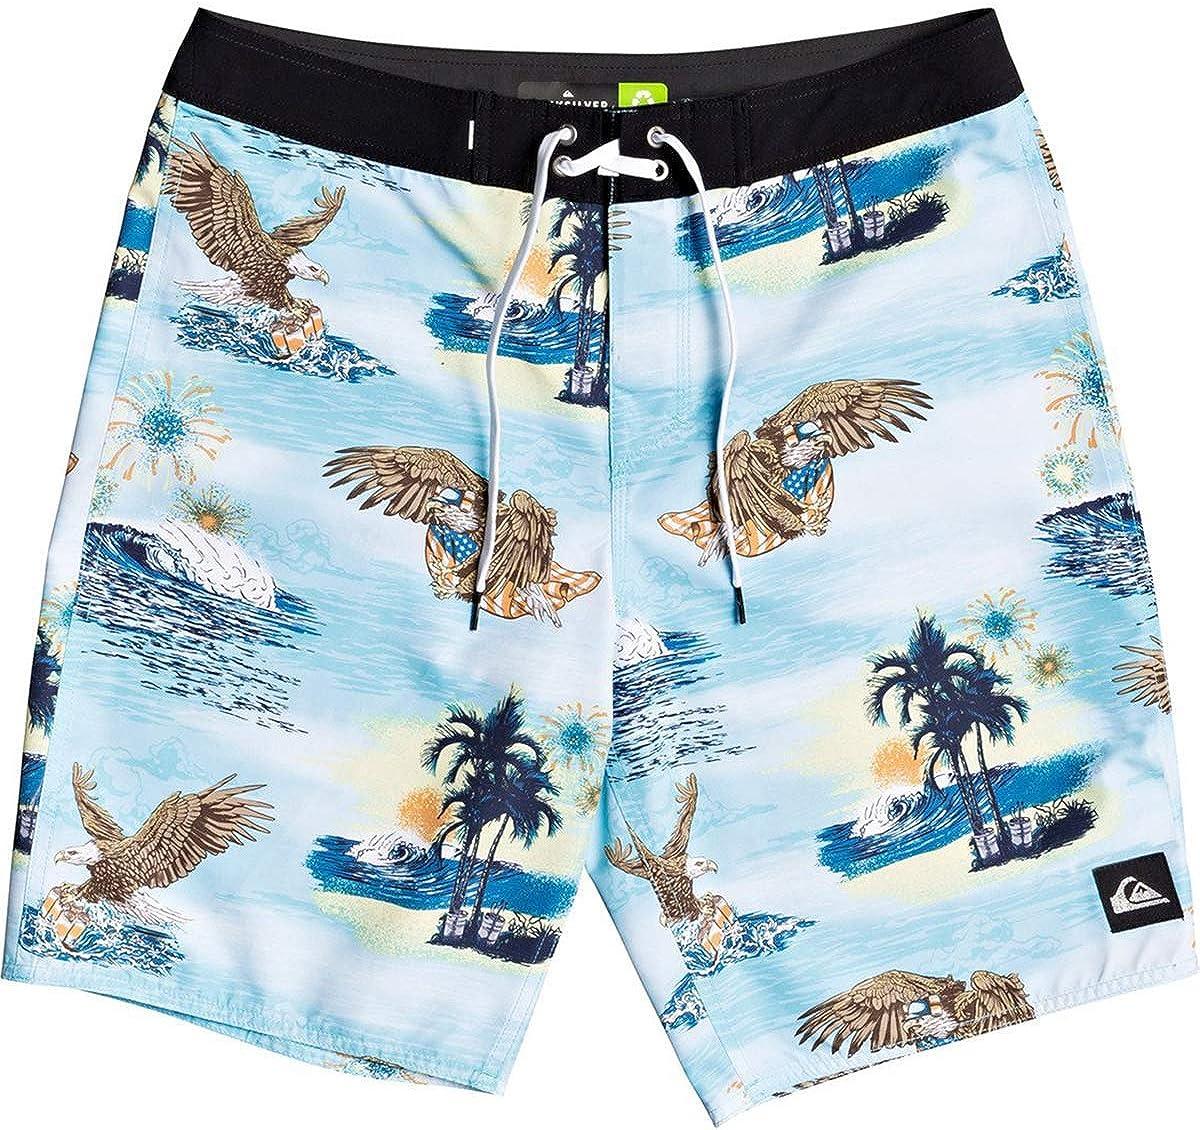 Quiksilver Men's Everyday Max 52% OFF America 4th sale of Tr Boardshort Swim July